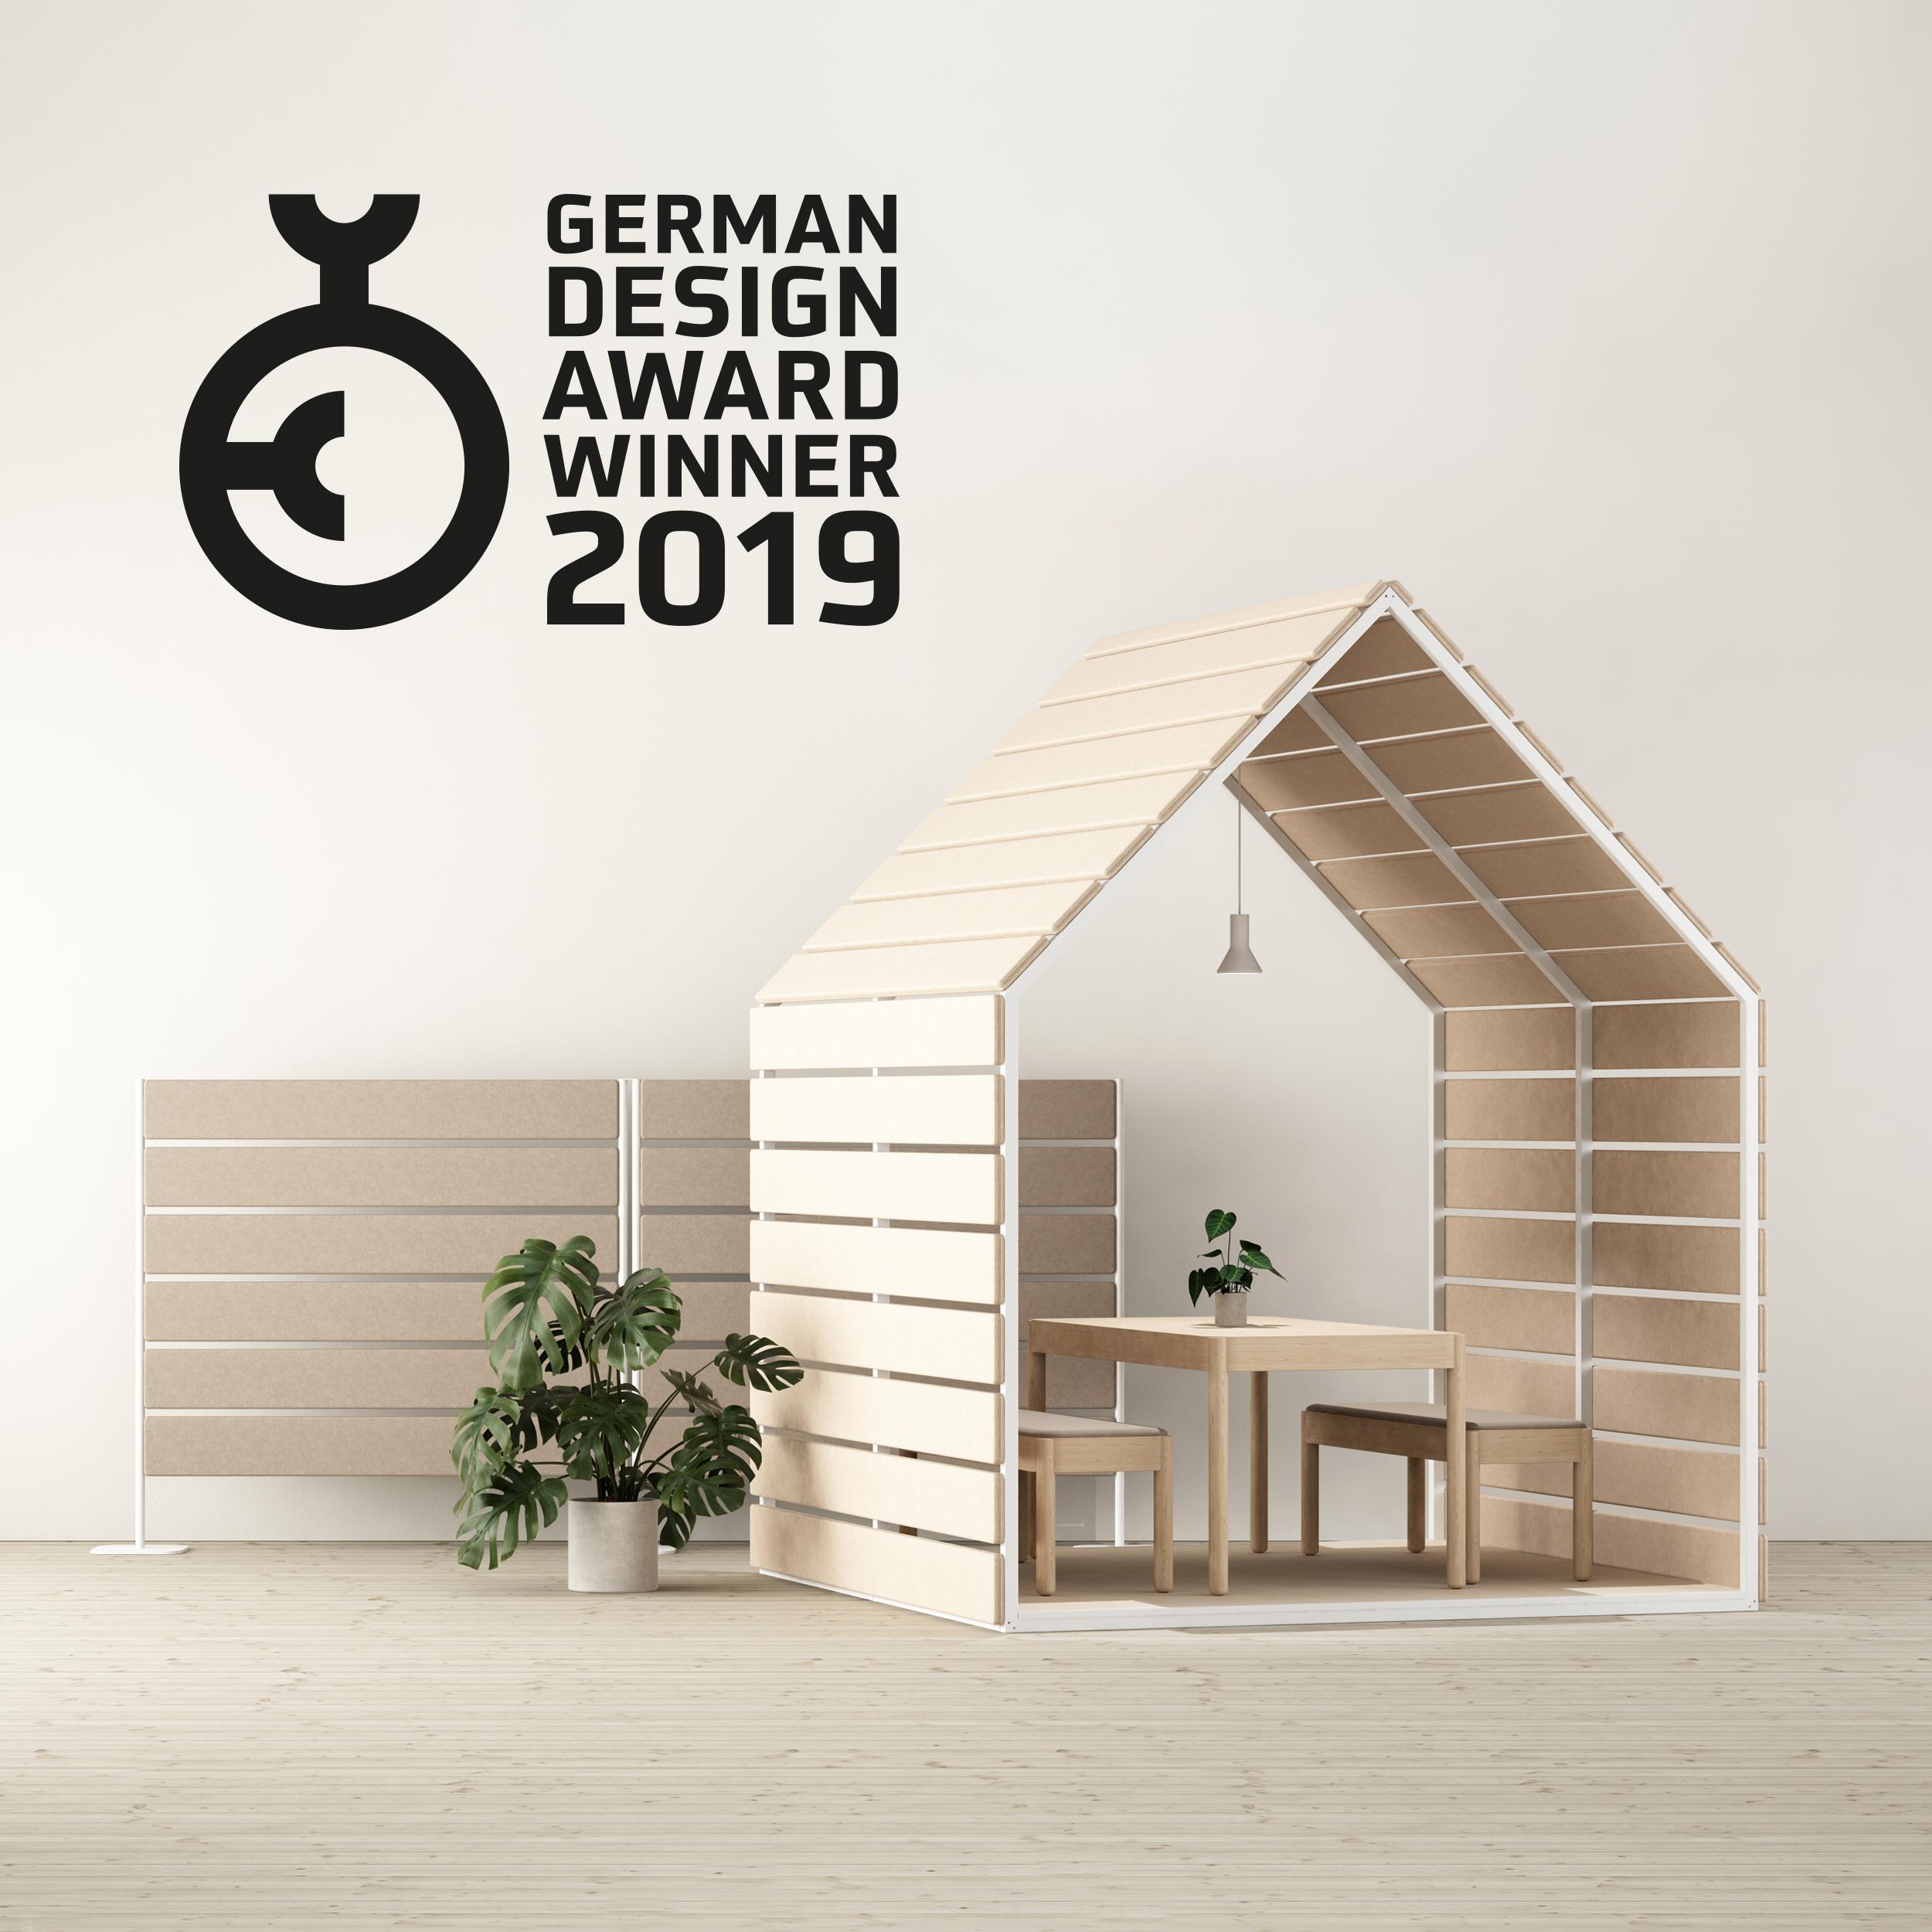 The barn & Fences - Winner - German Design Award 2019 - Design Kauppi & Kauppi